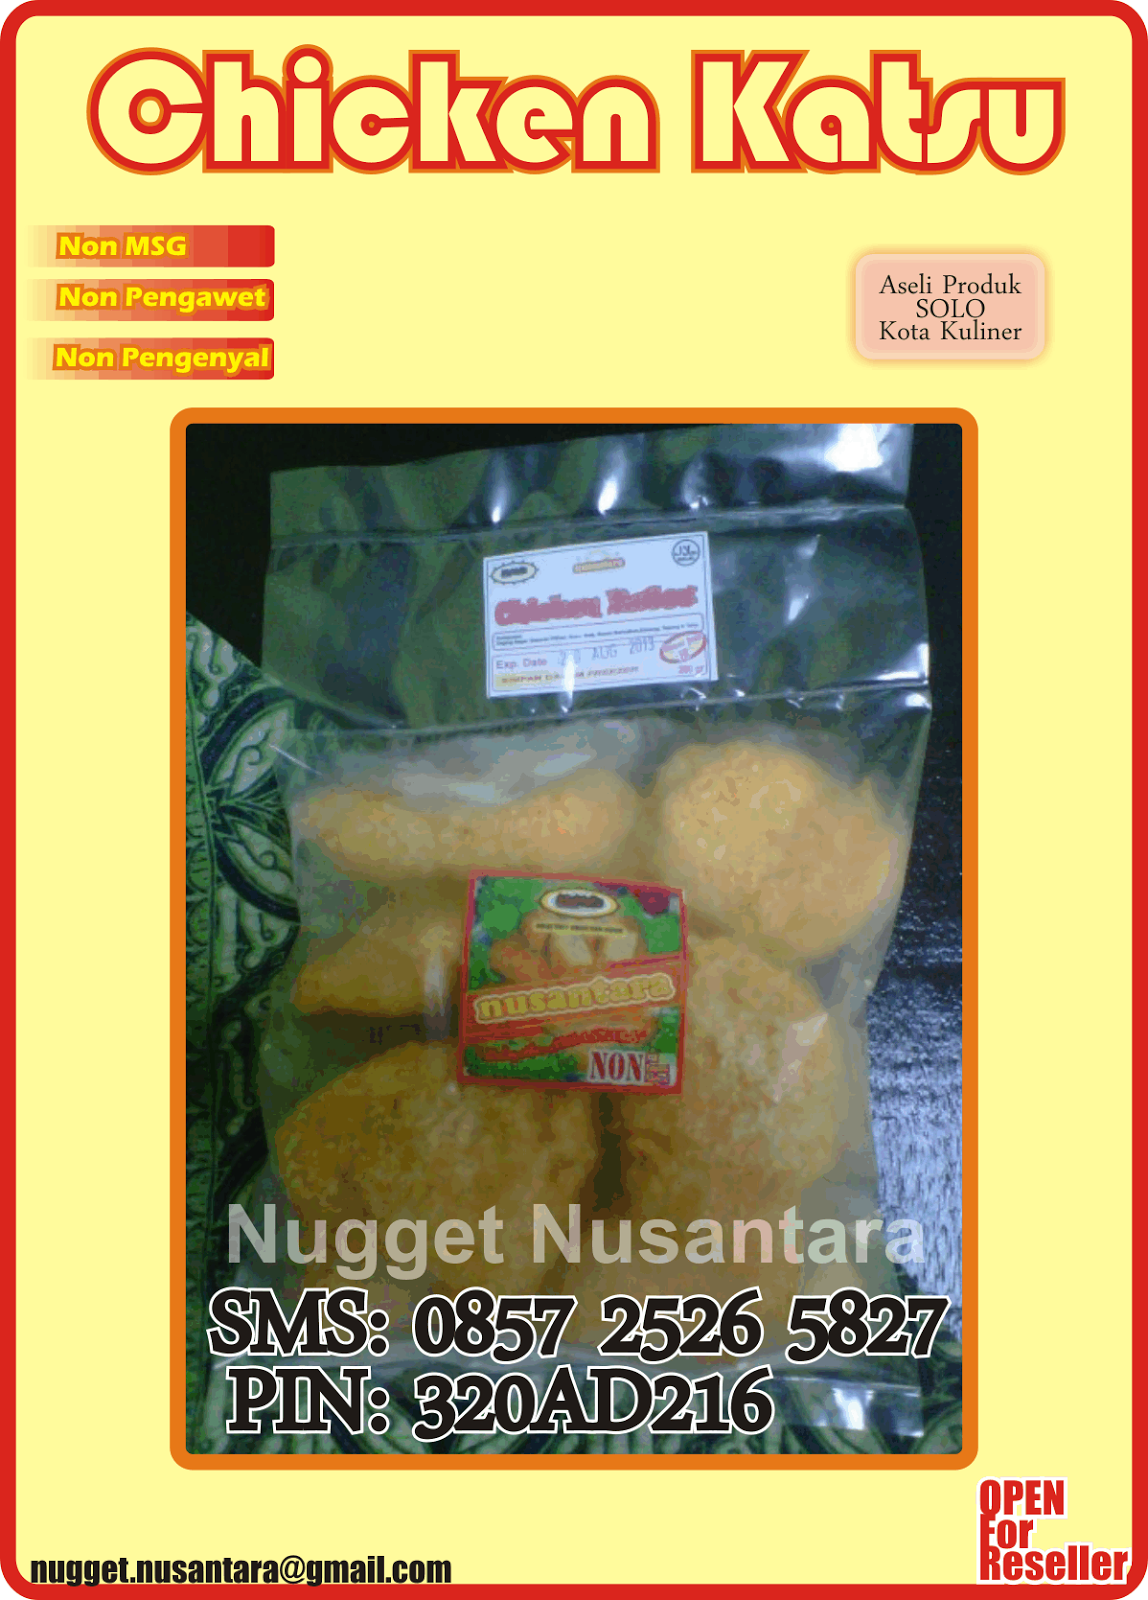 NUGGET SEHAT SOLO: Chicken Katsu